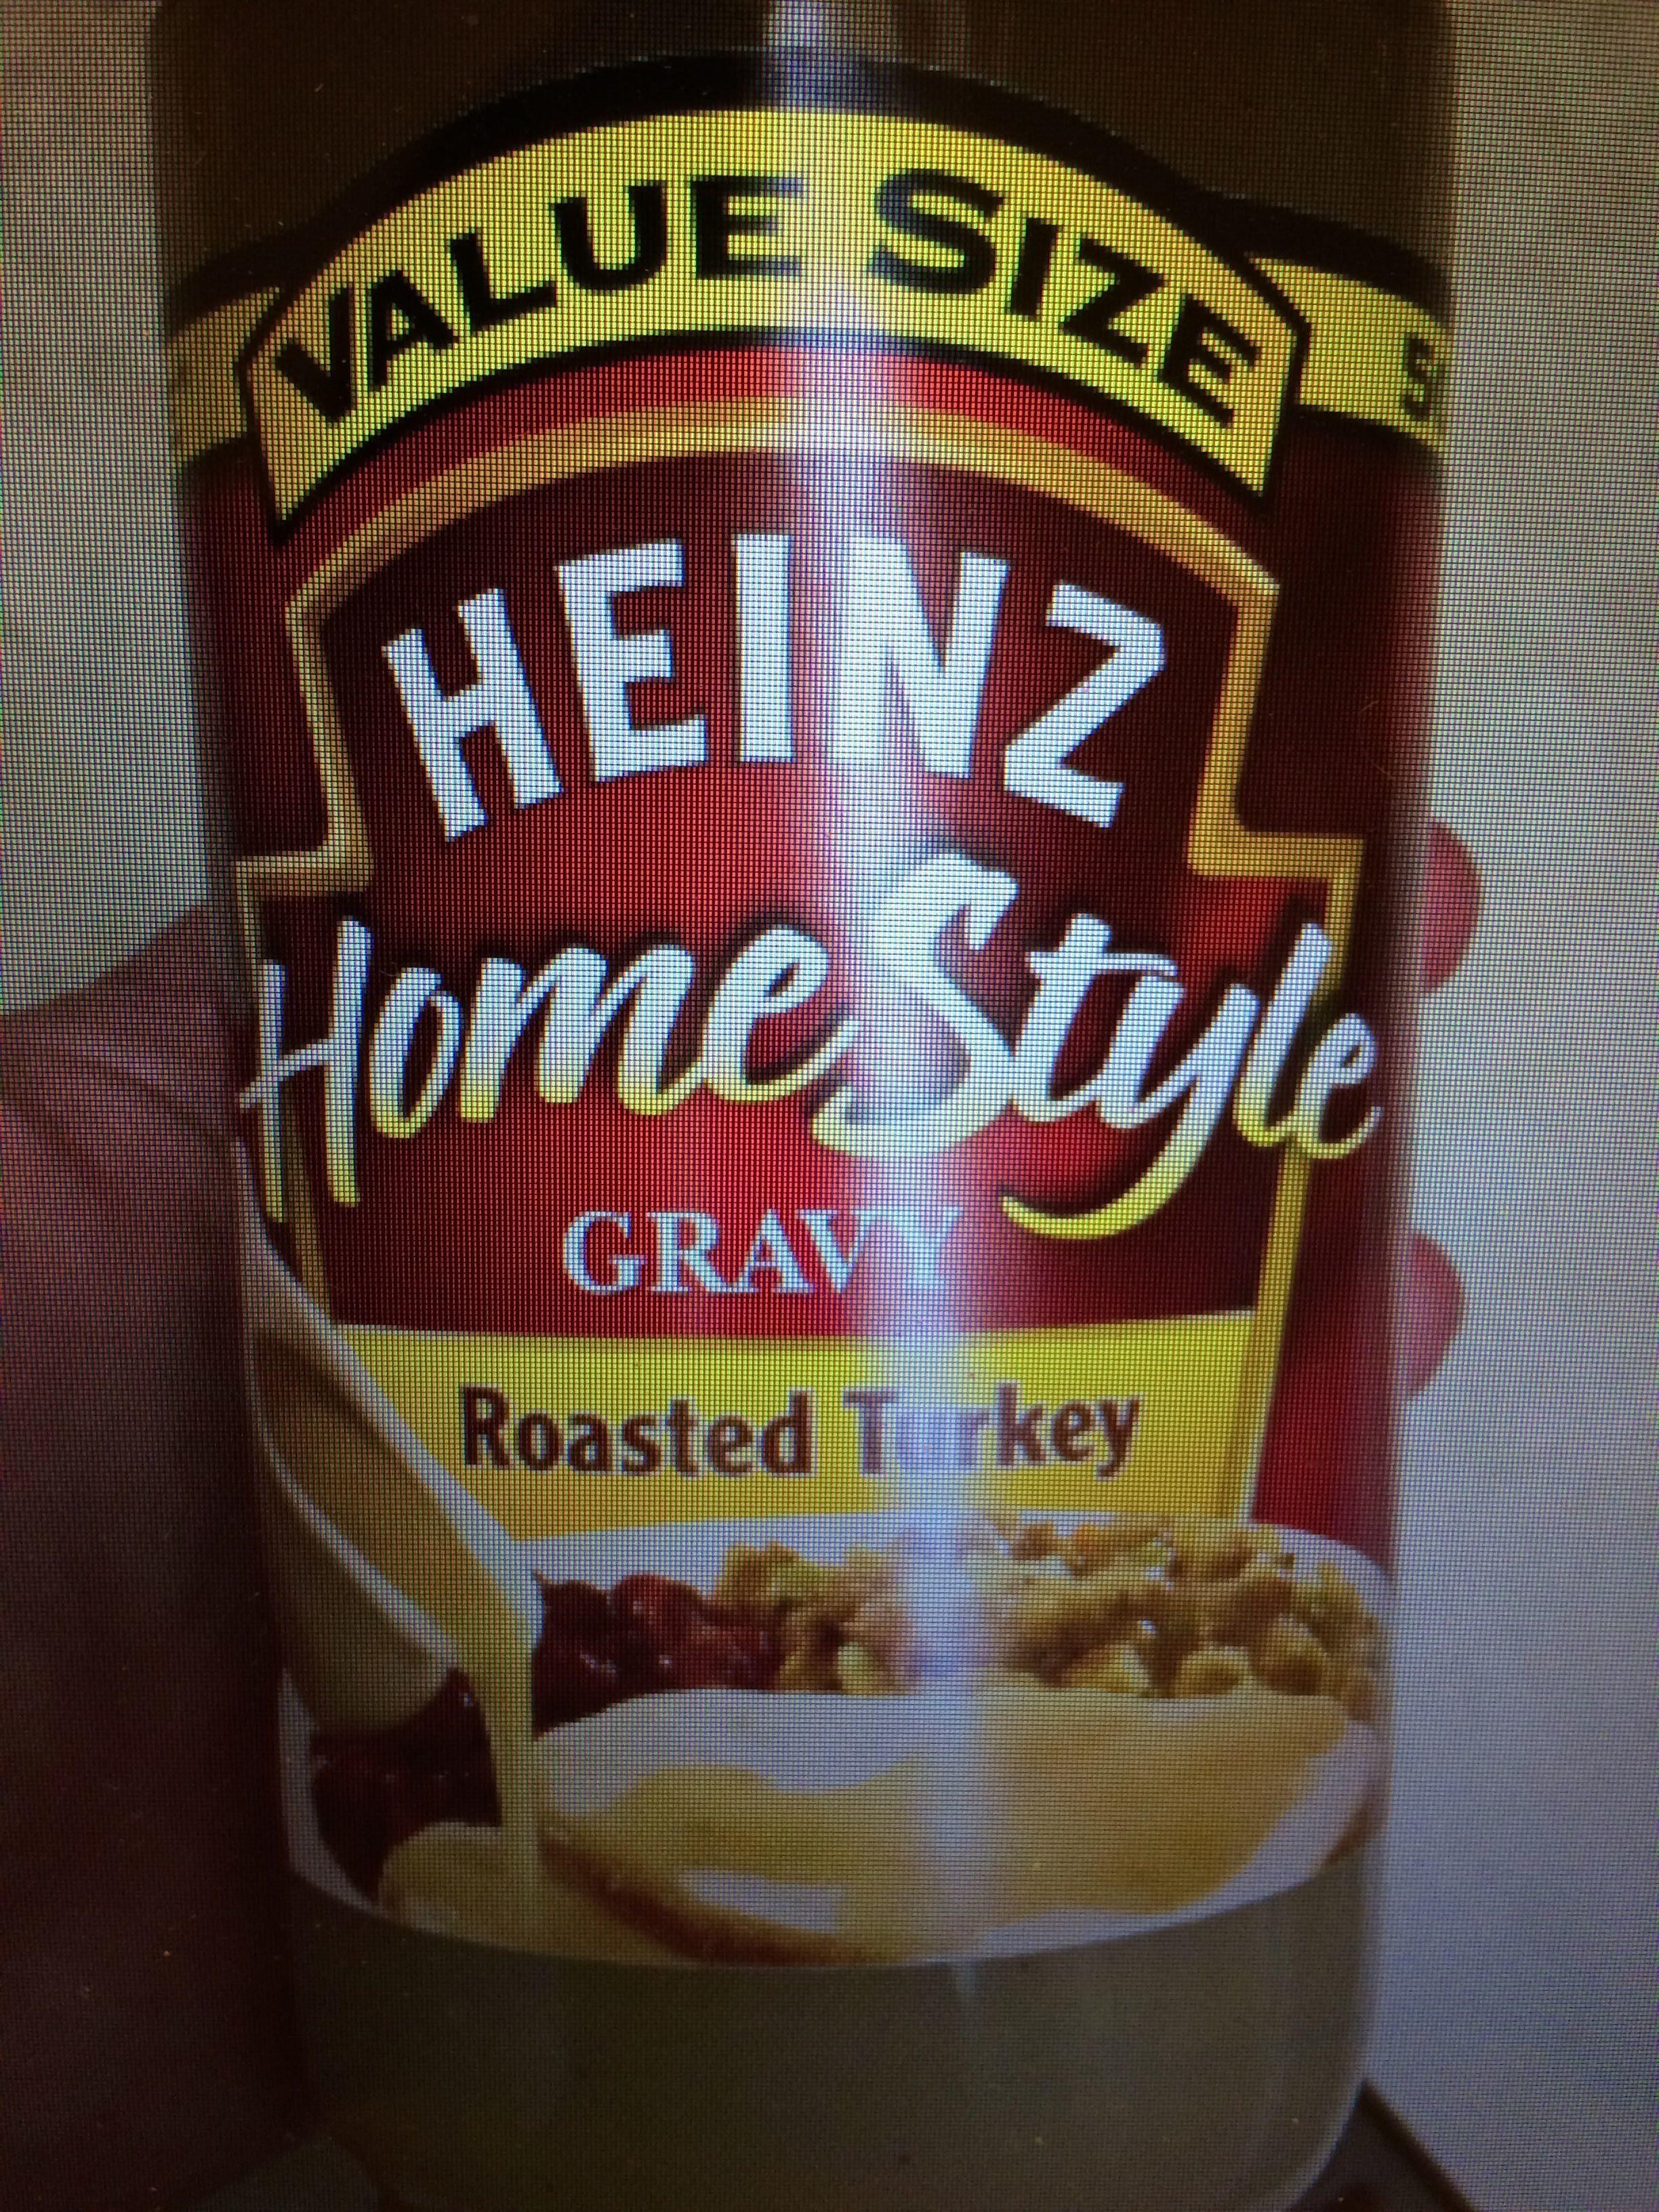 Home style gravy - Produit - en